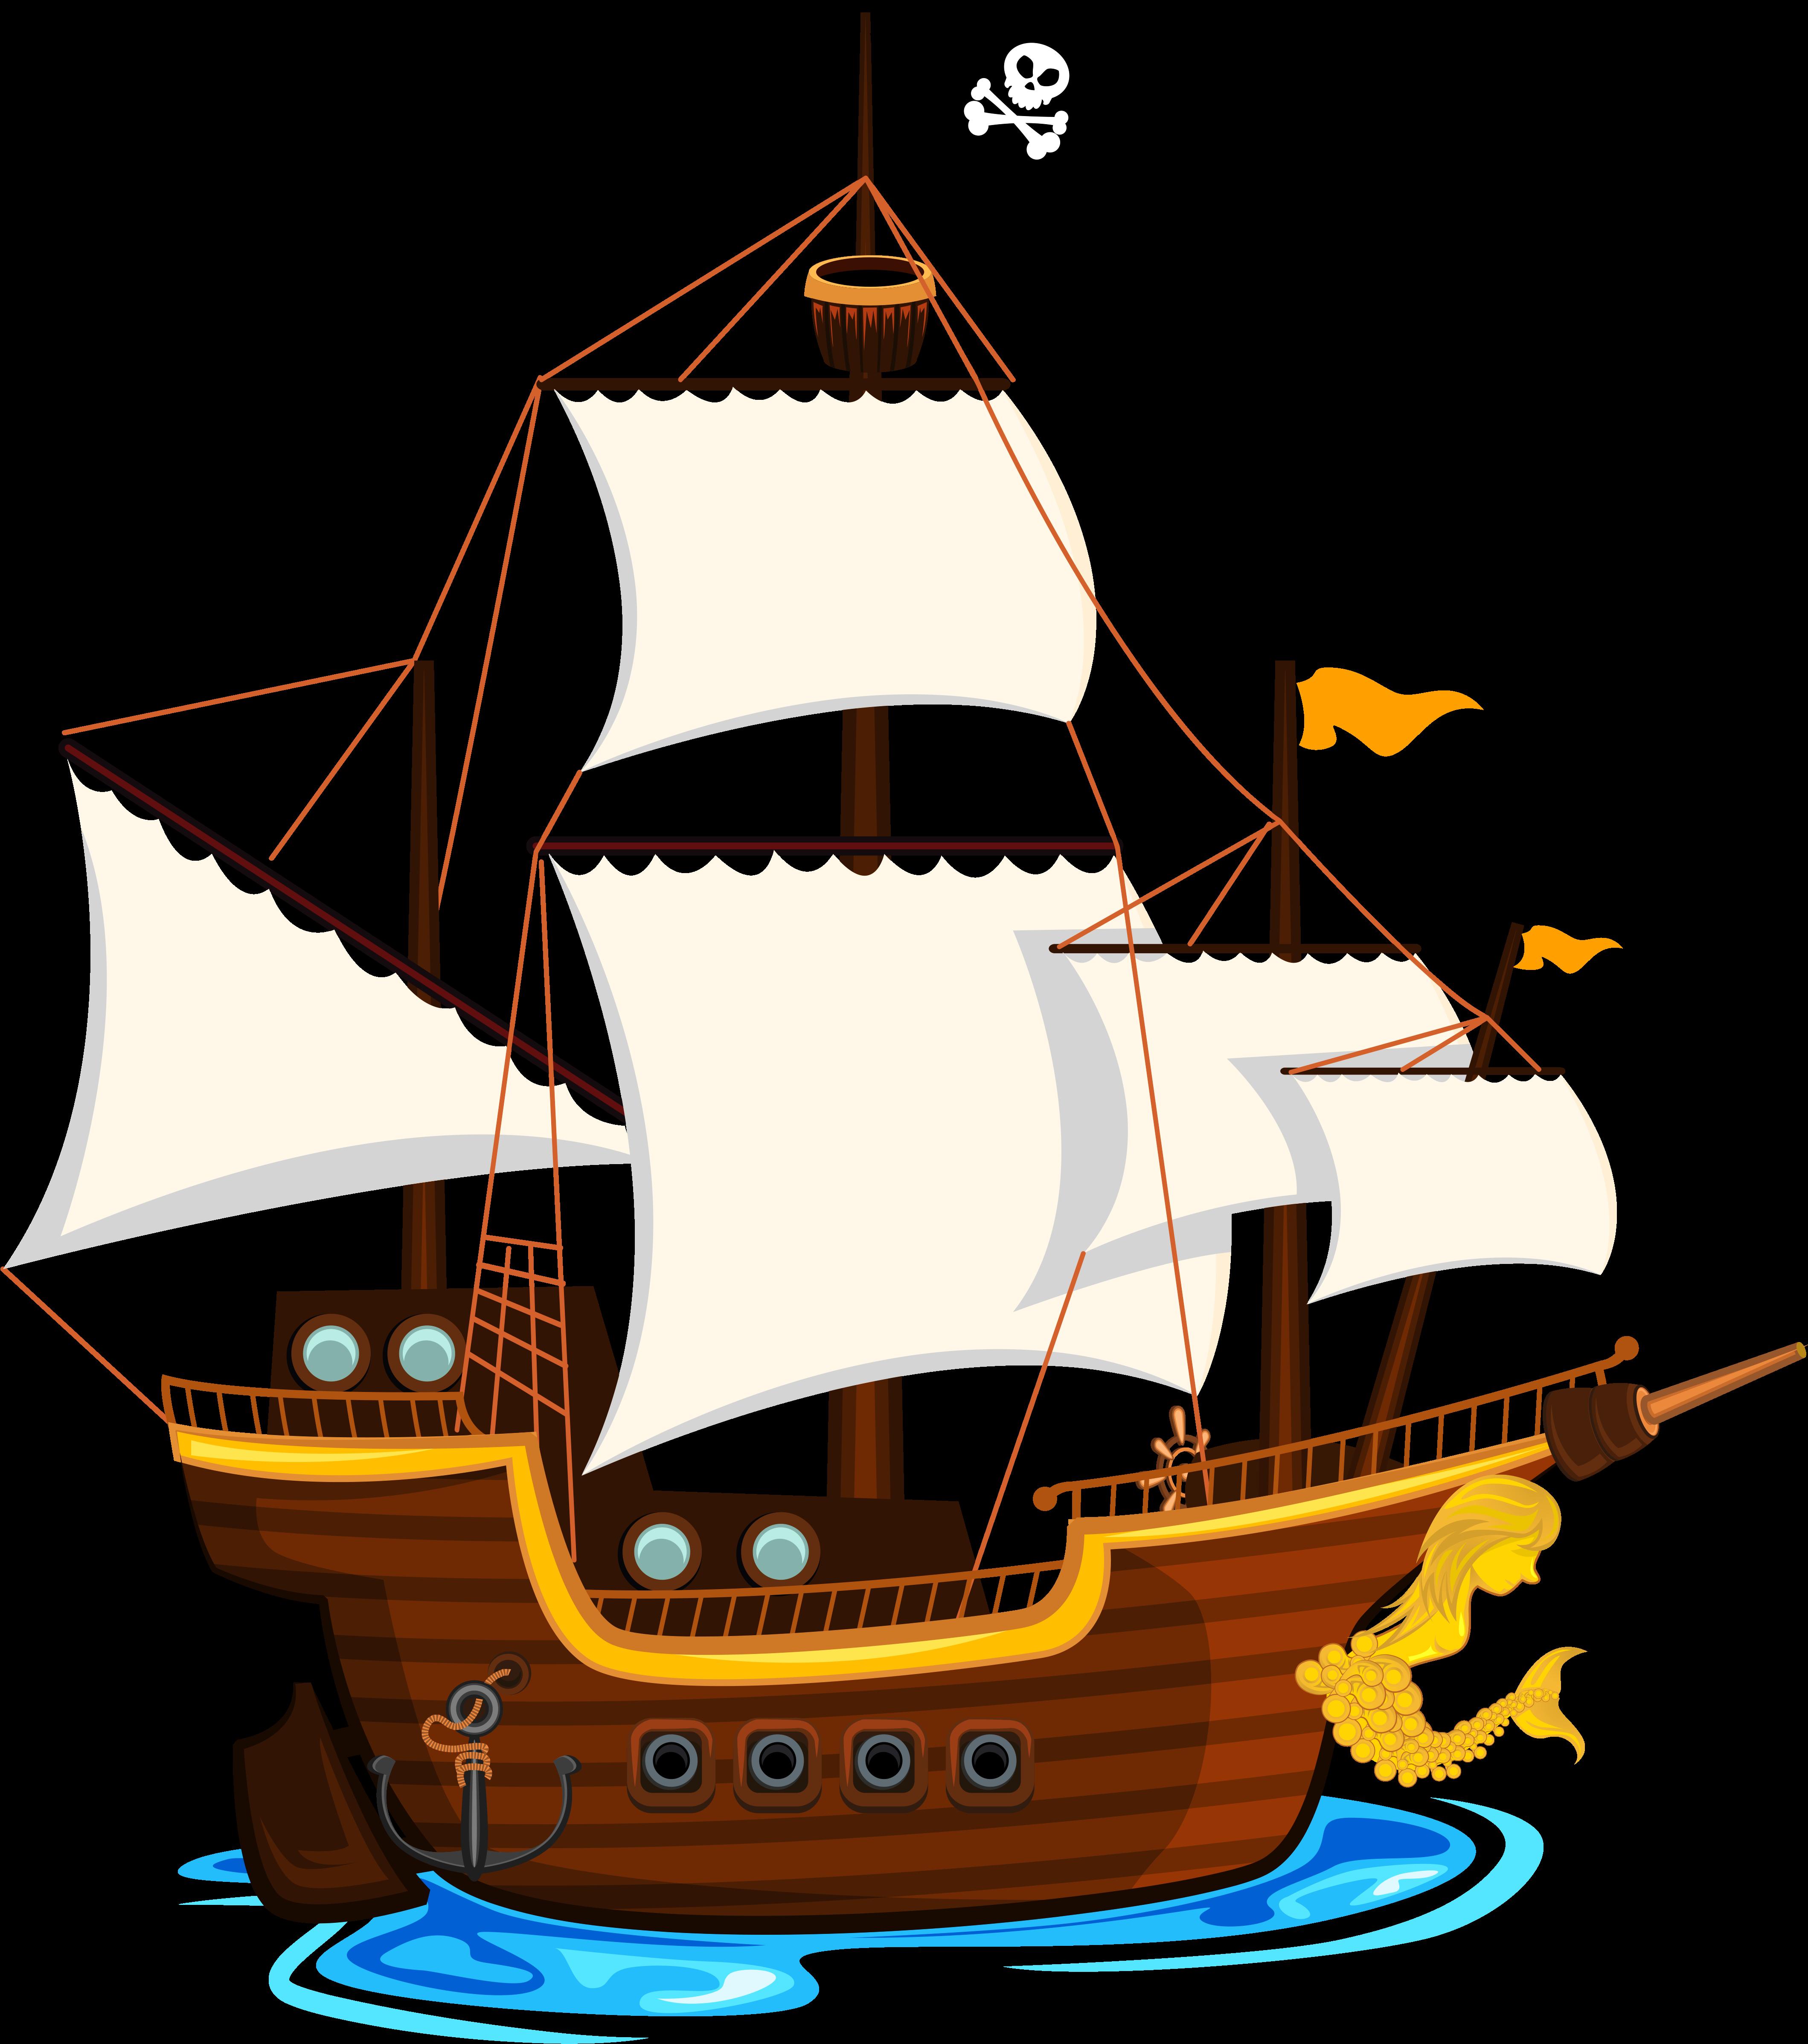 Big pirate ship clipart vector stock E D Ea C Orig Edeacorig - Pirate Ship Clip Art Png Transparent Png ... vector stock